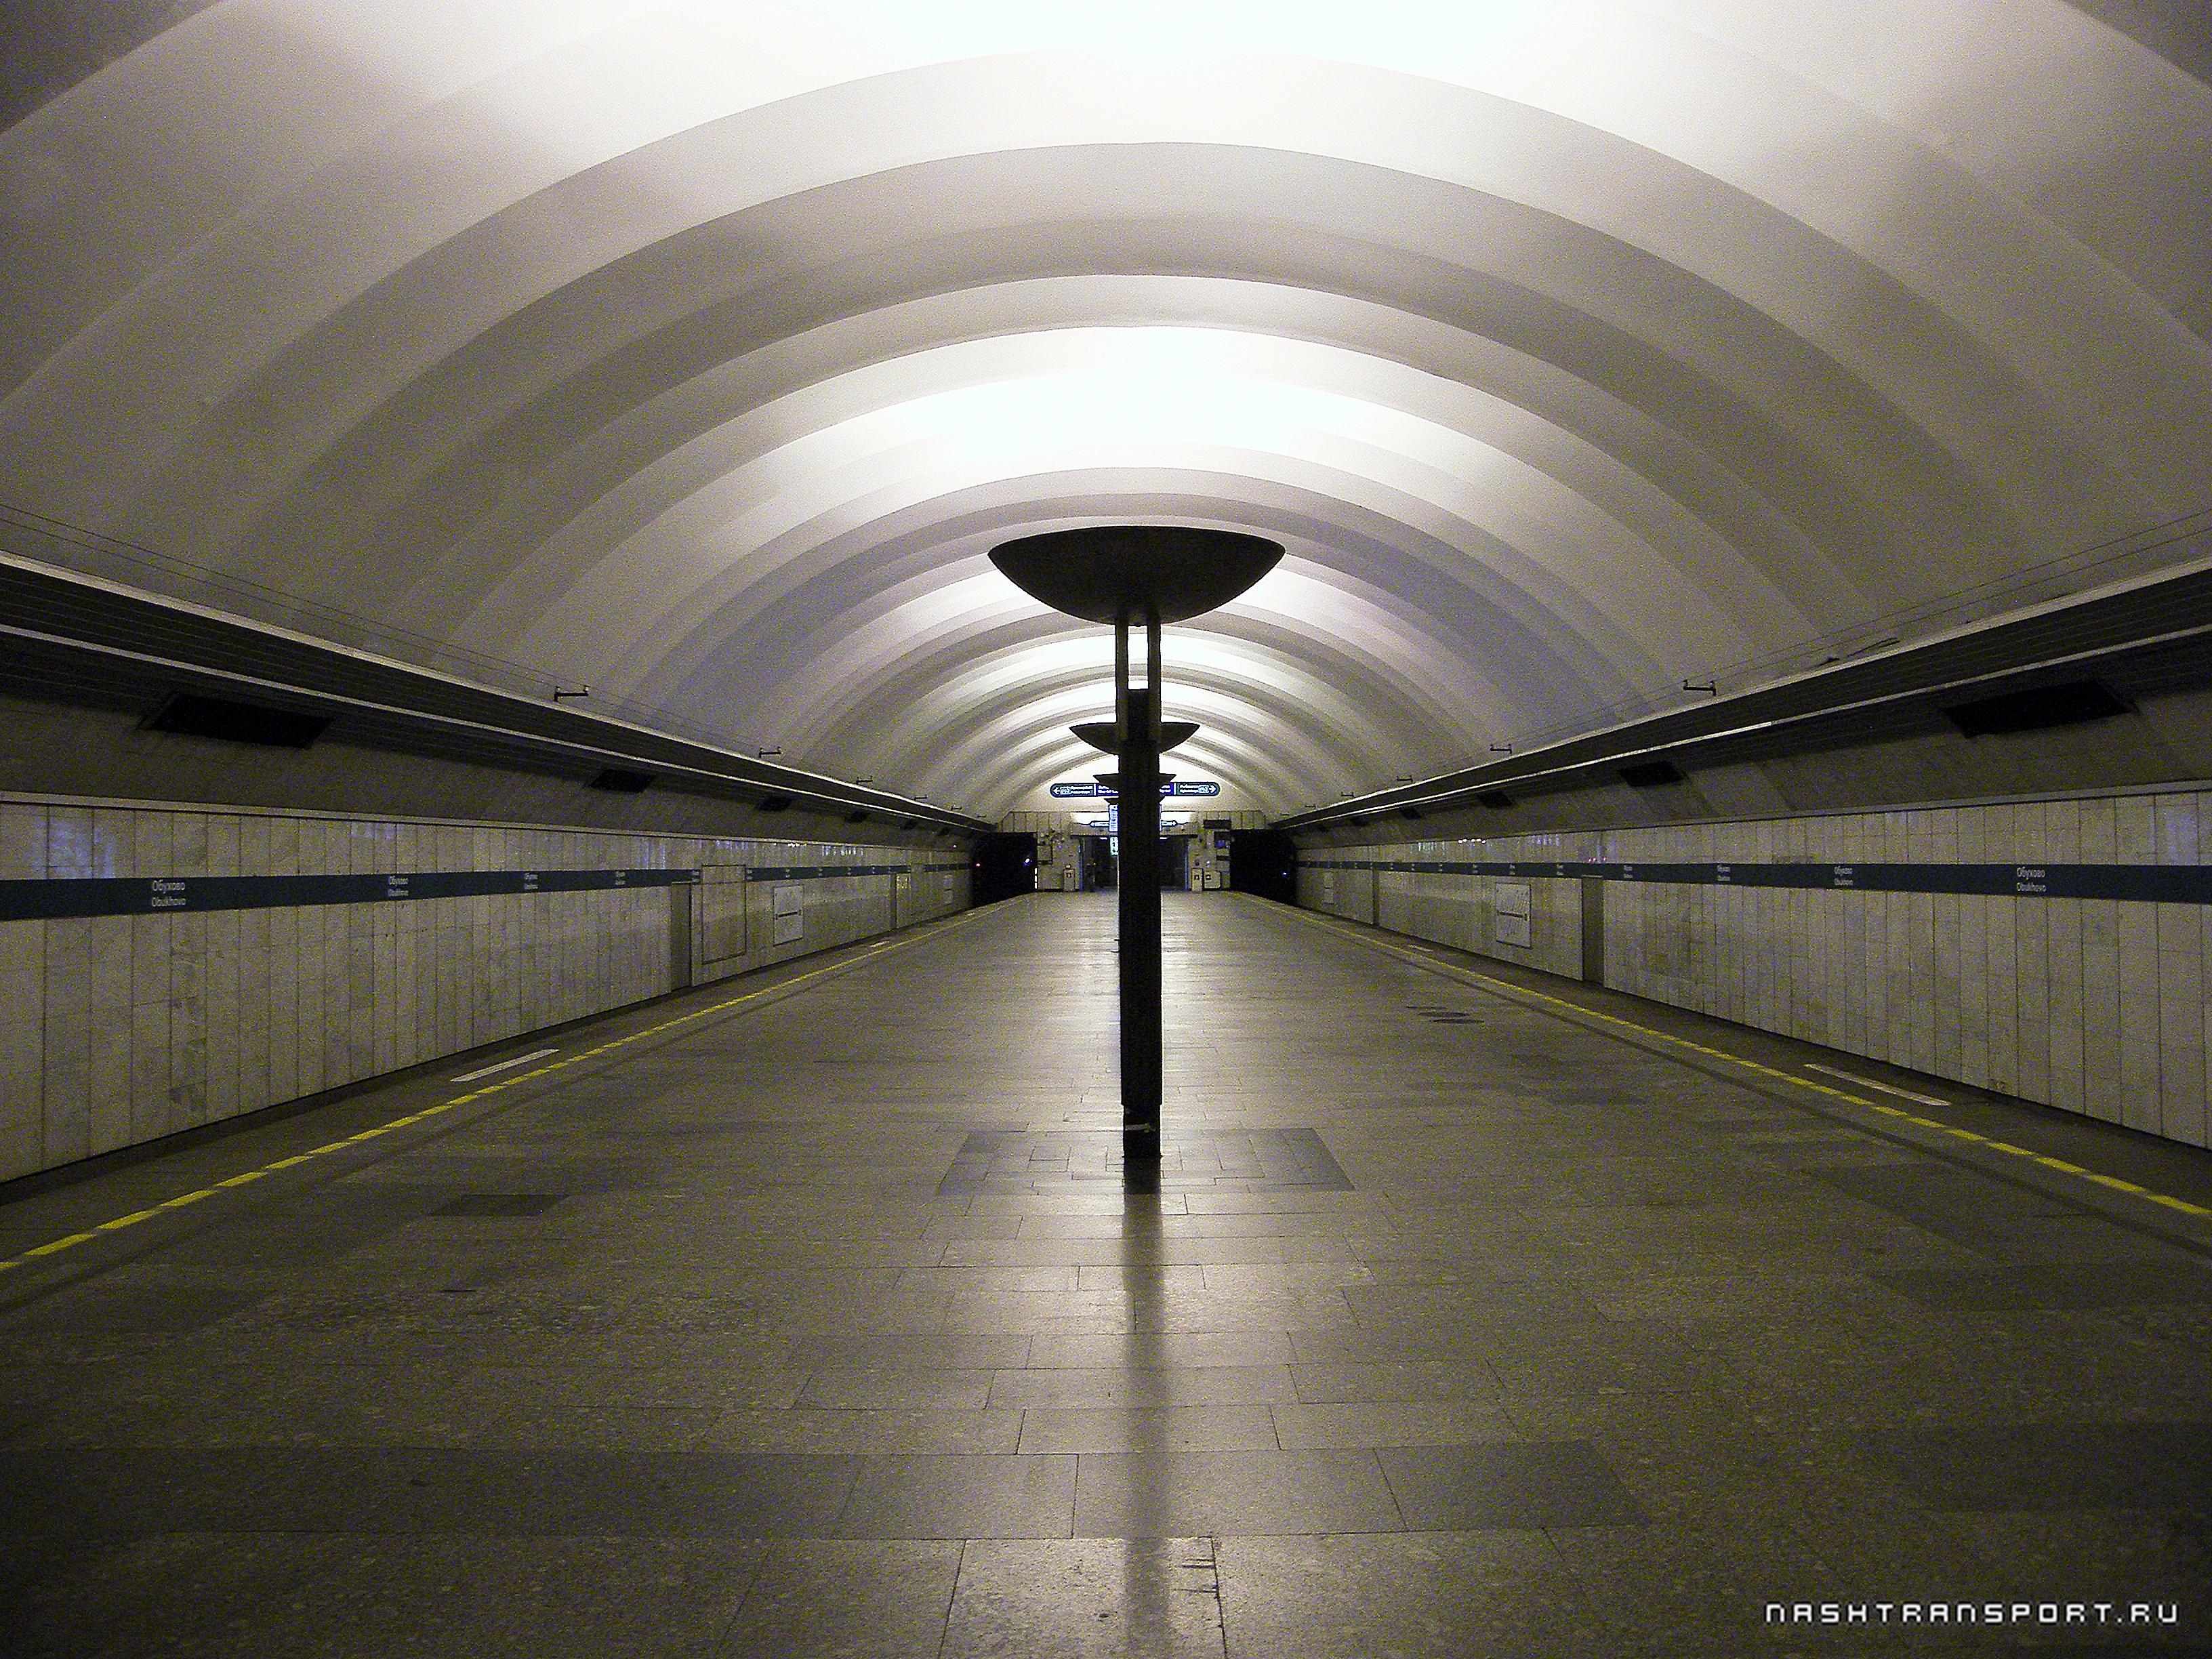 метро ломоносовская санкт петербург фото